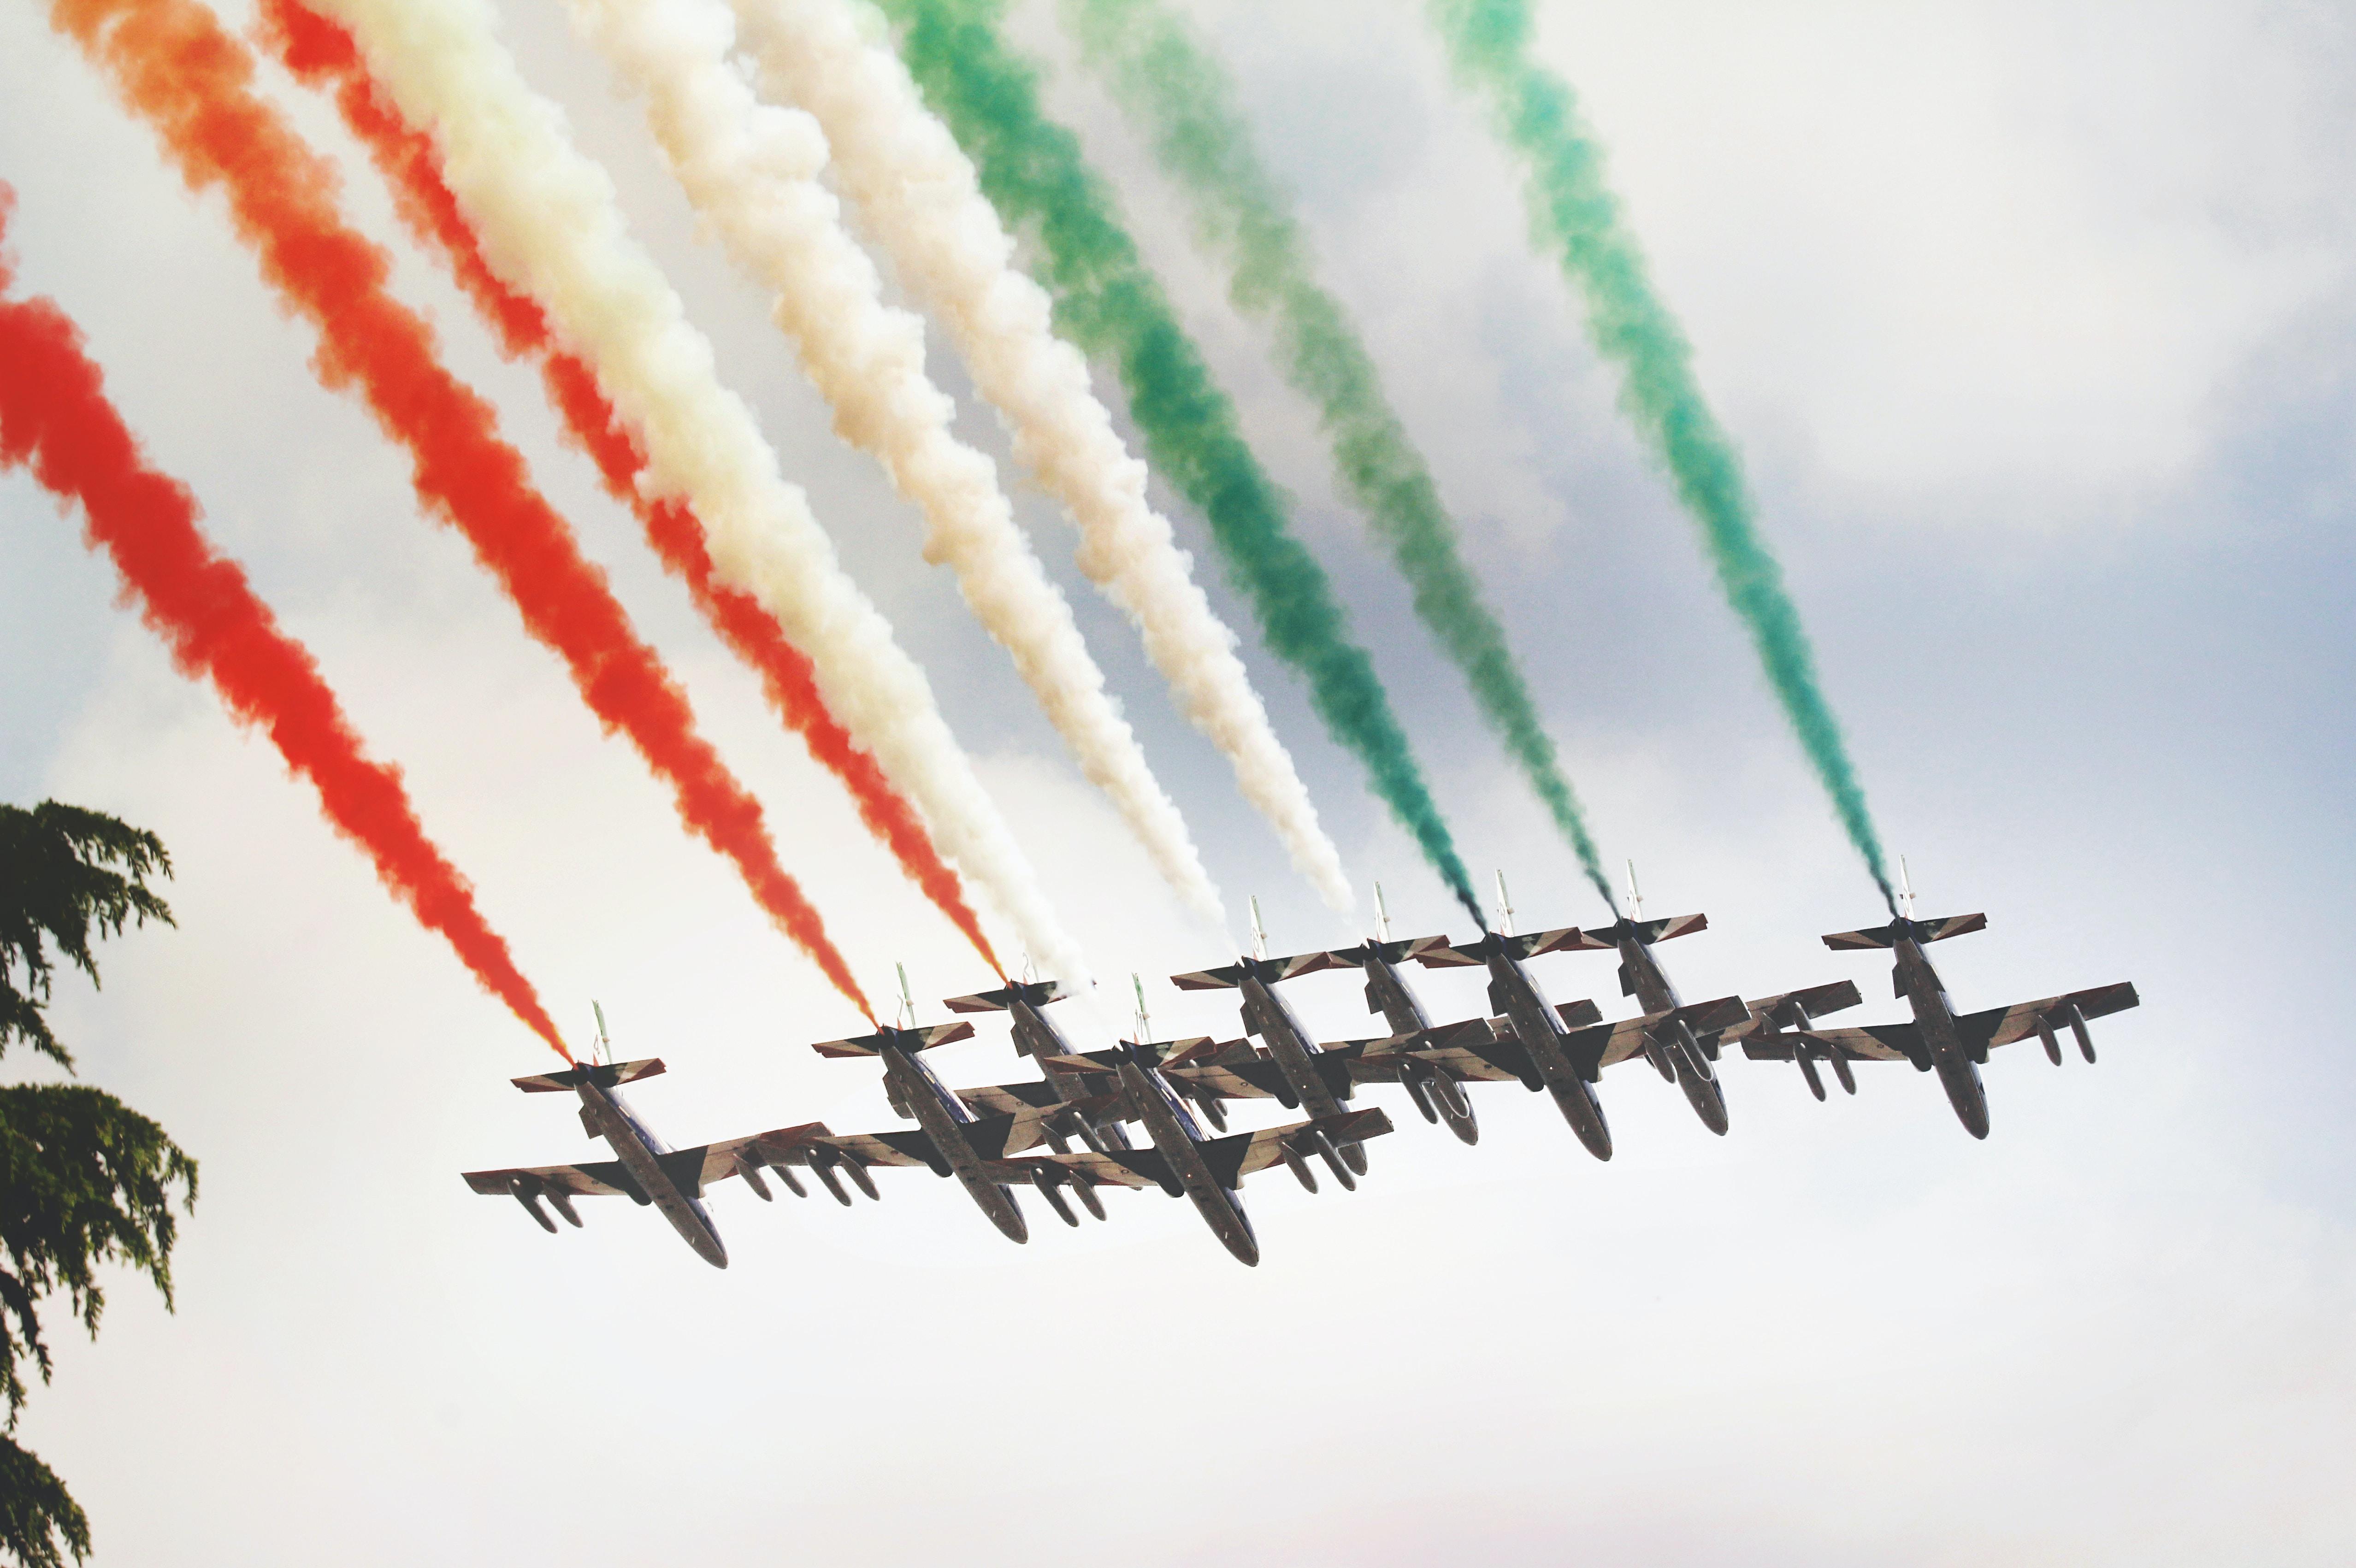 fighting jets performing aerobatics